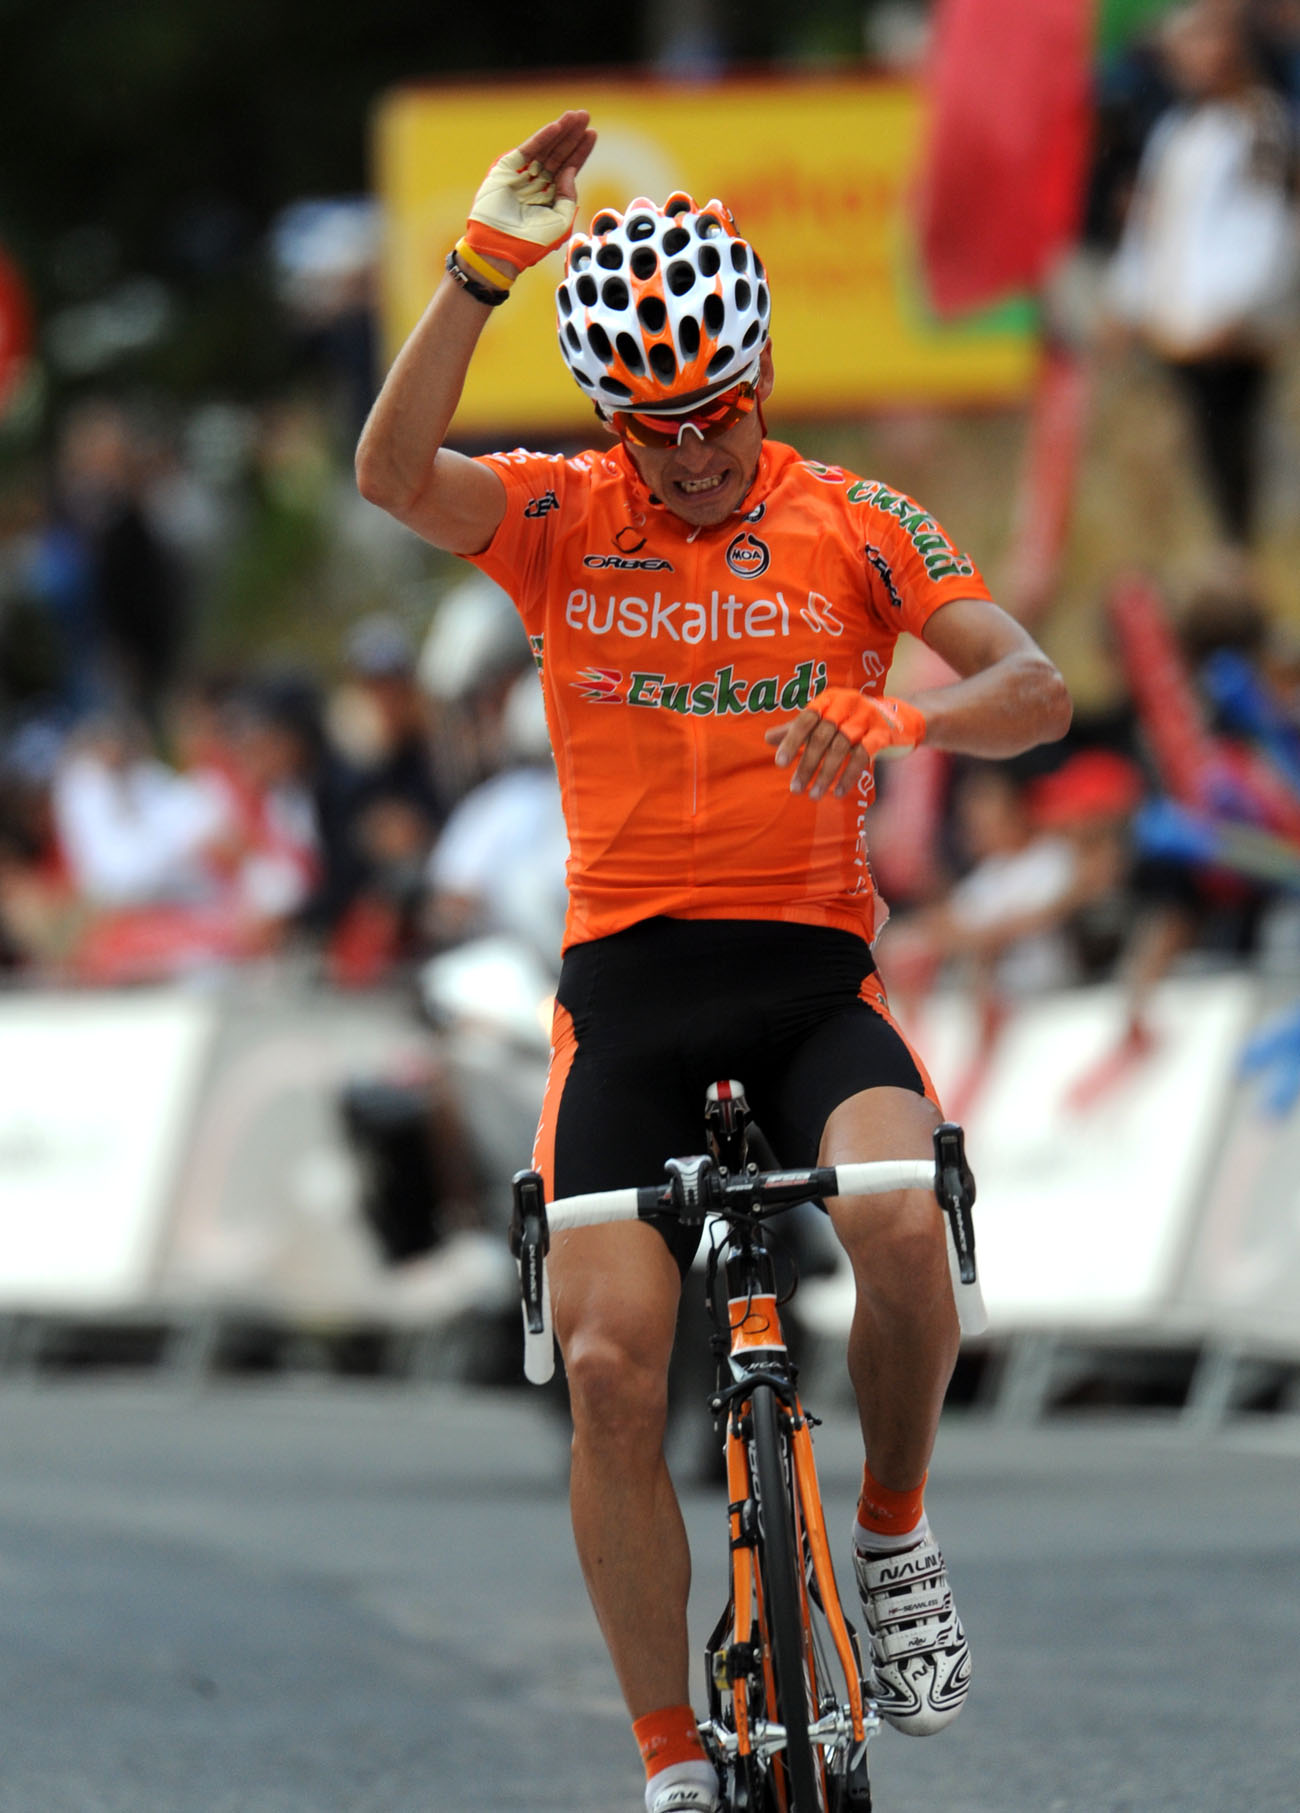 Igor Anton, Vuelta a Espana 2010, stage 11